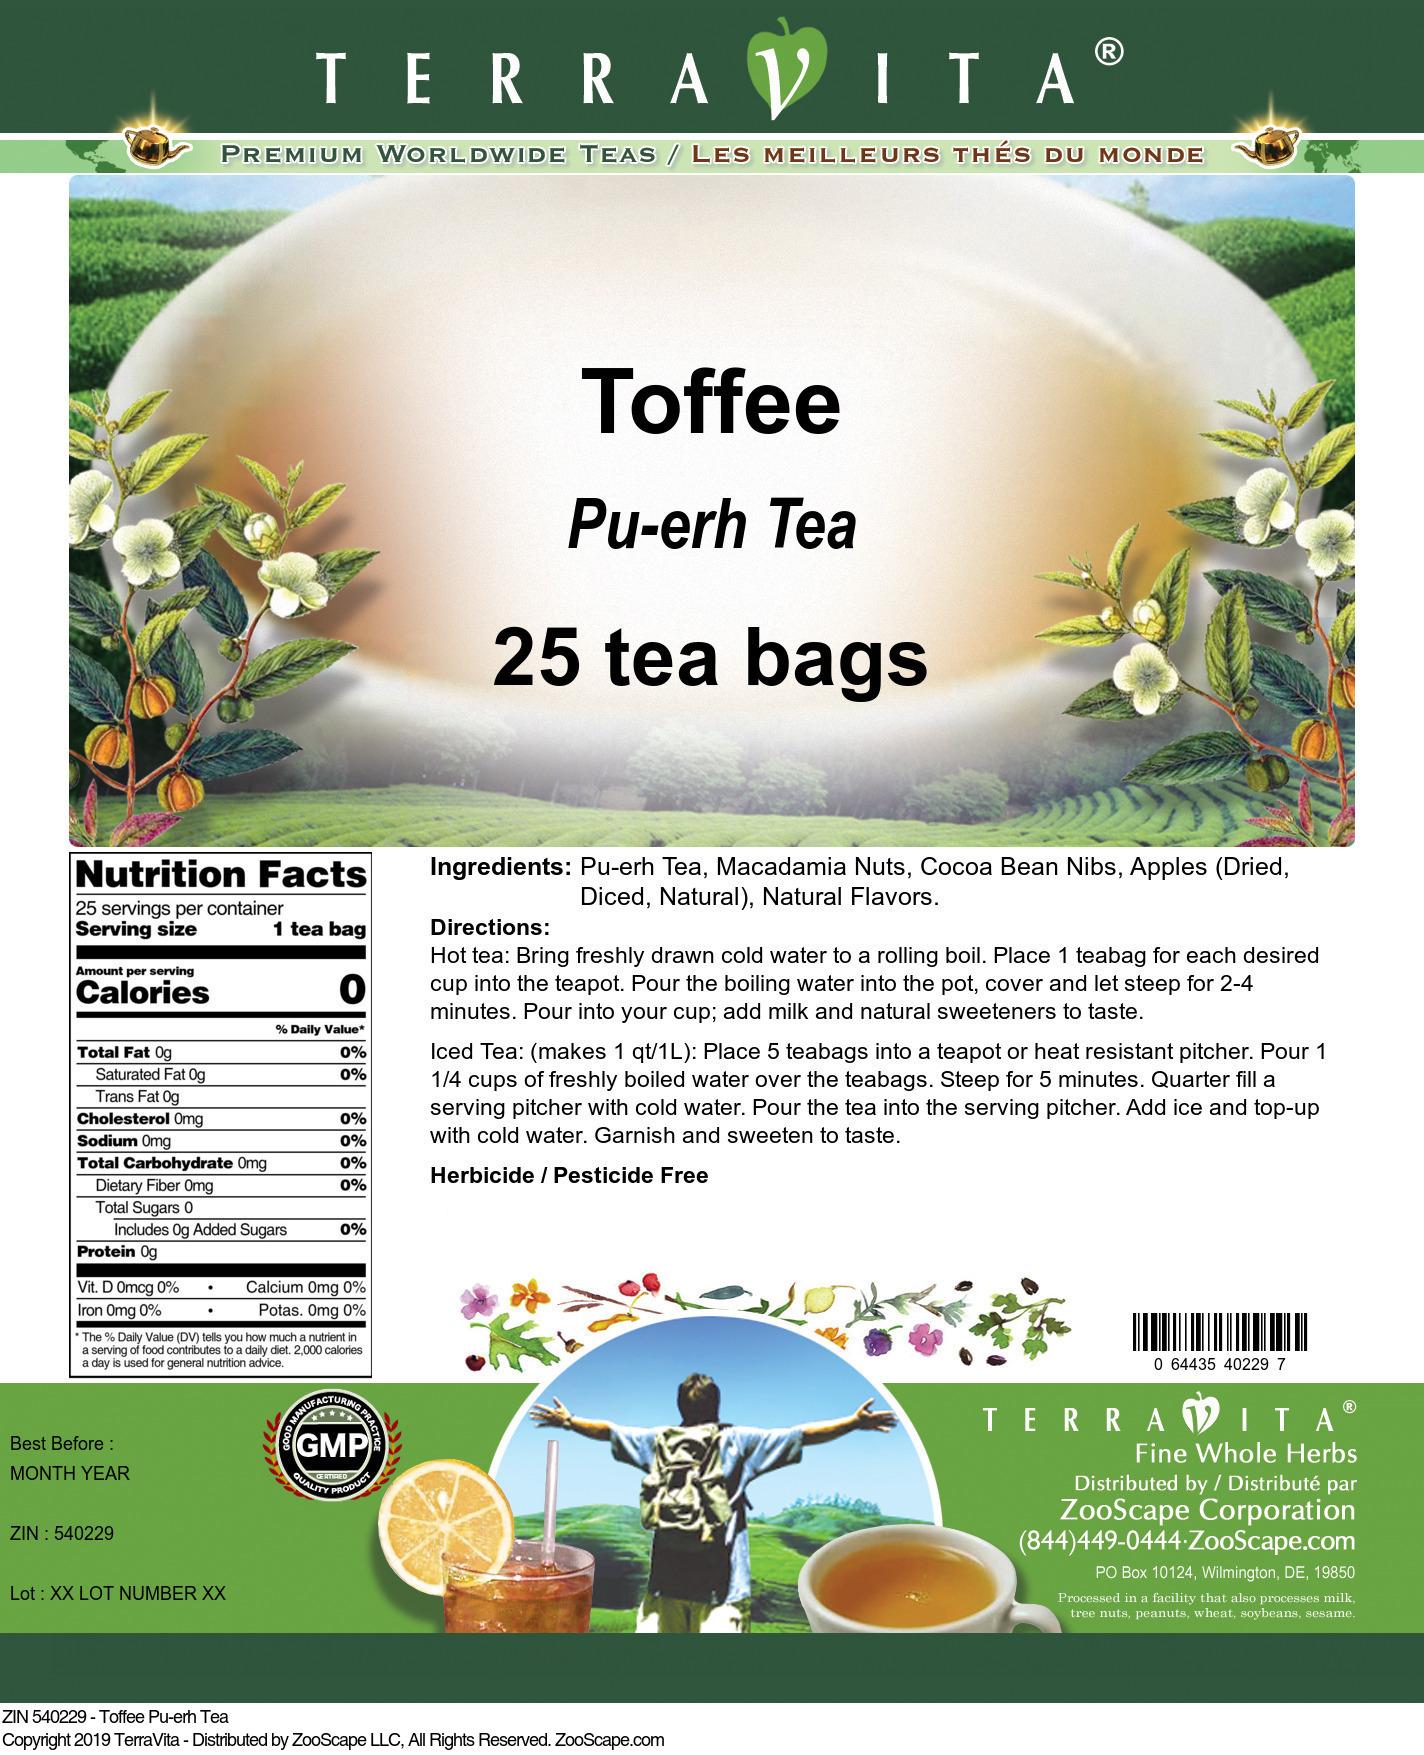 Toffee Pu-erh Tea